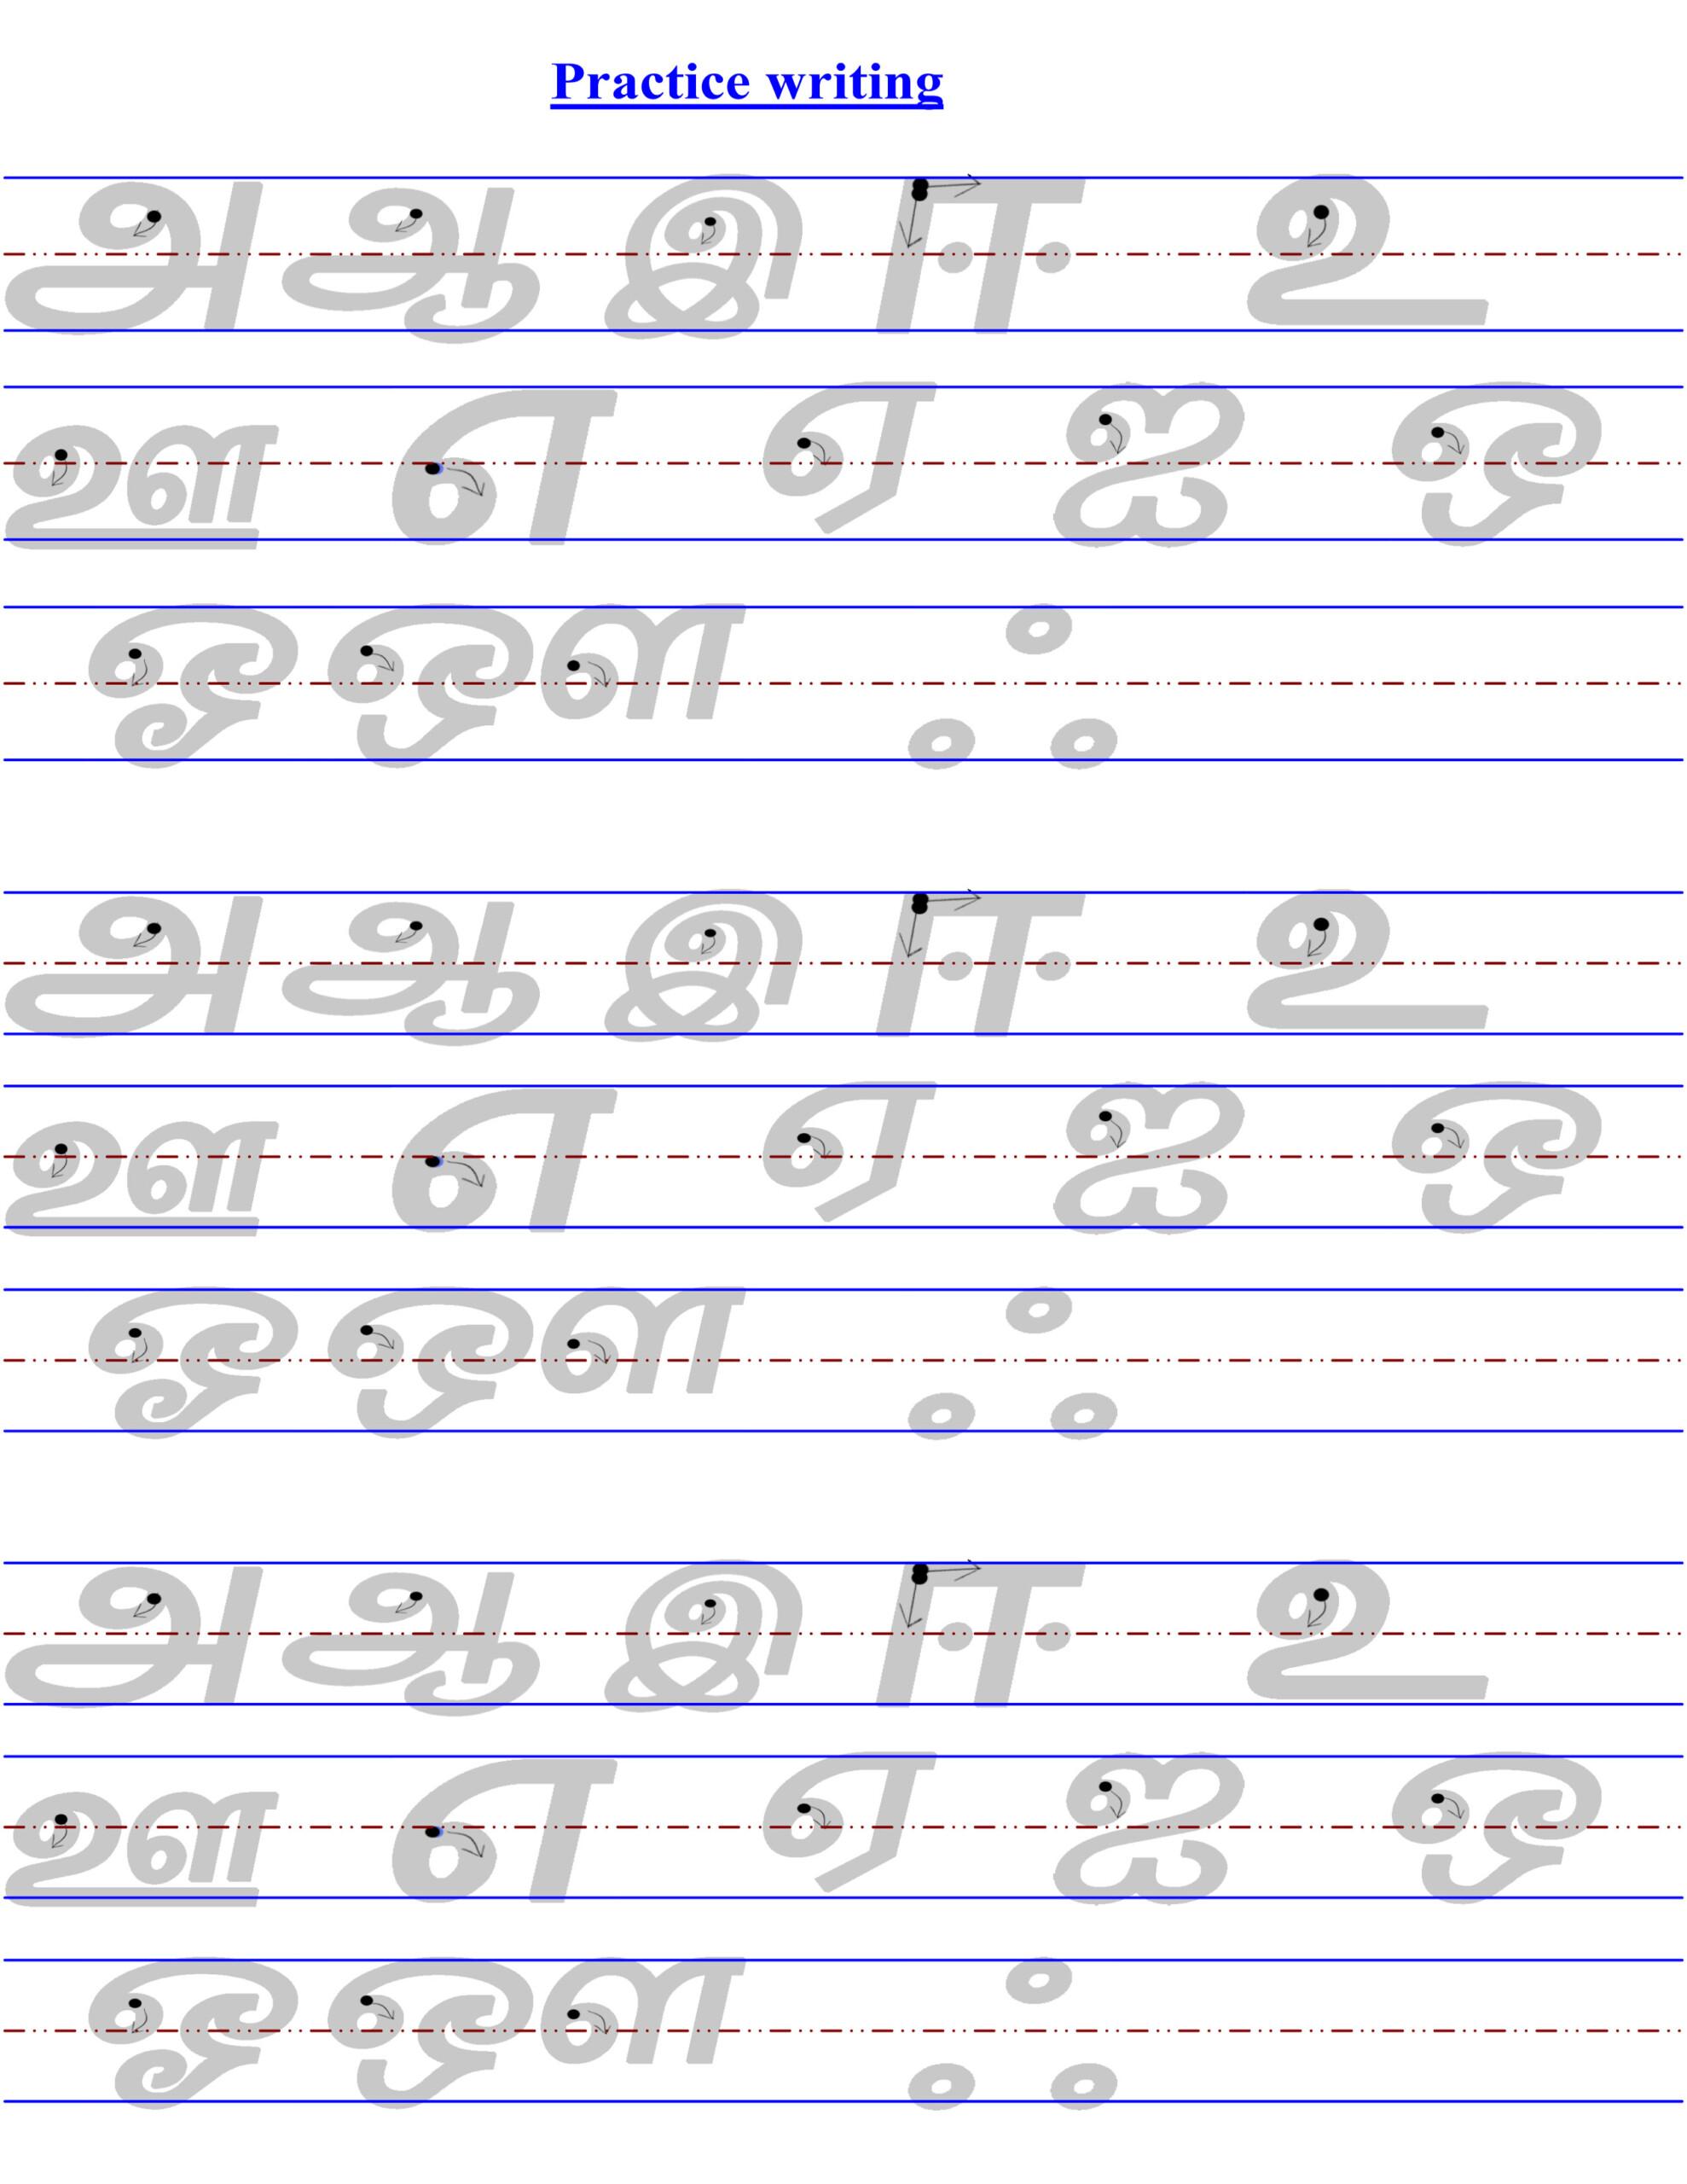 Tamil Handwriting Practice Worksheets | Kids Activities inside Tamil Letters Tracing Worksheets